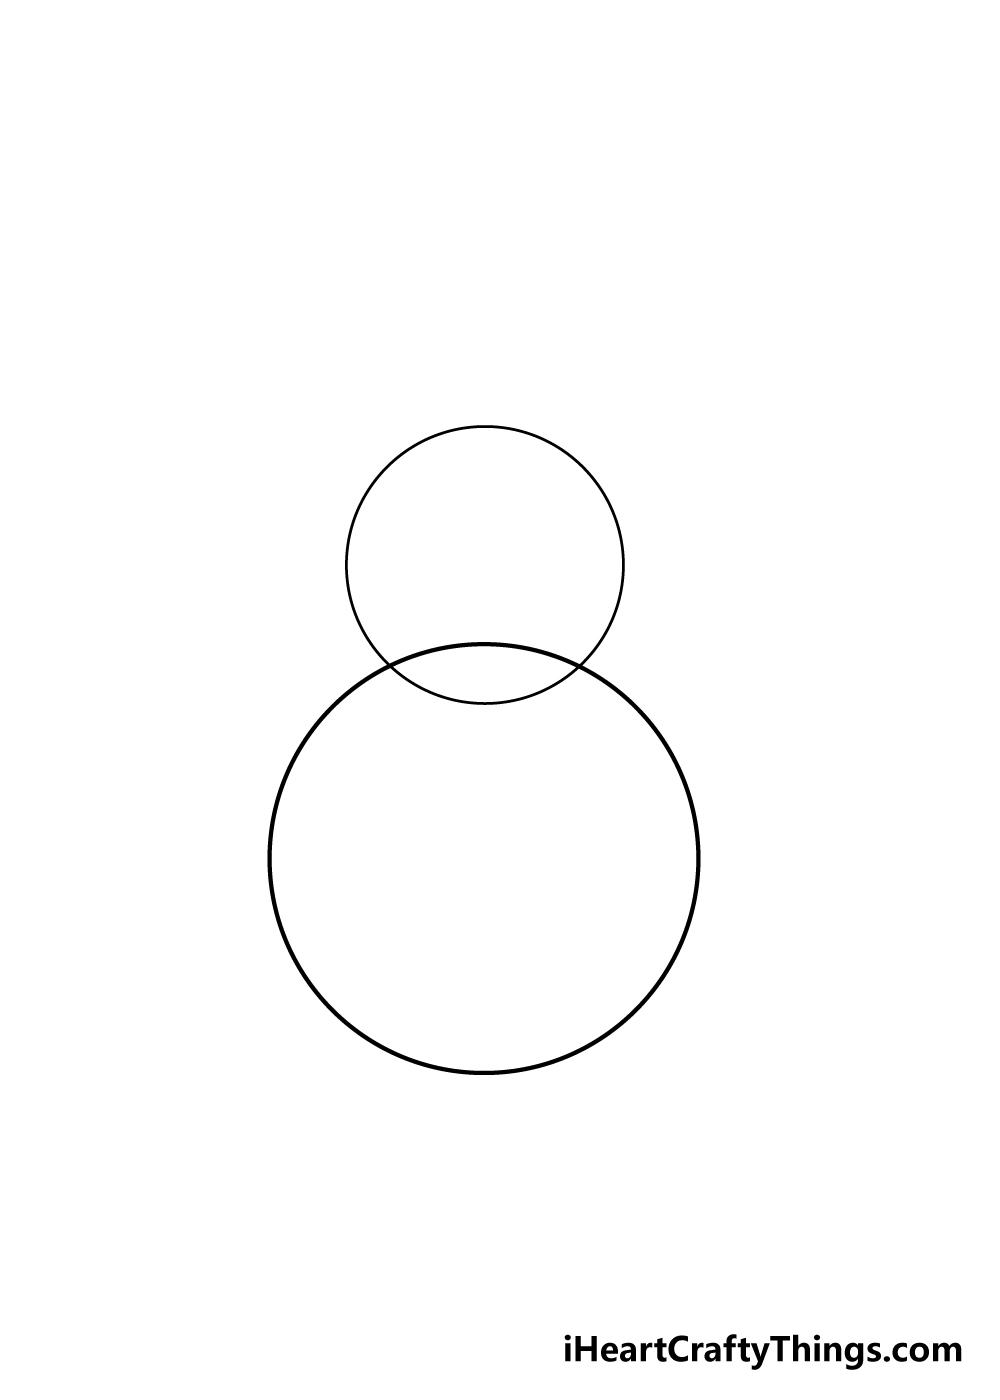 snowman drawing step 1